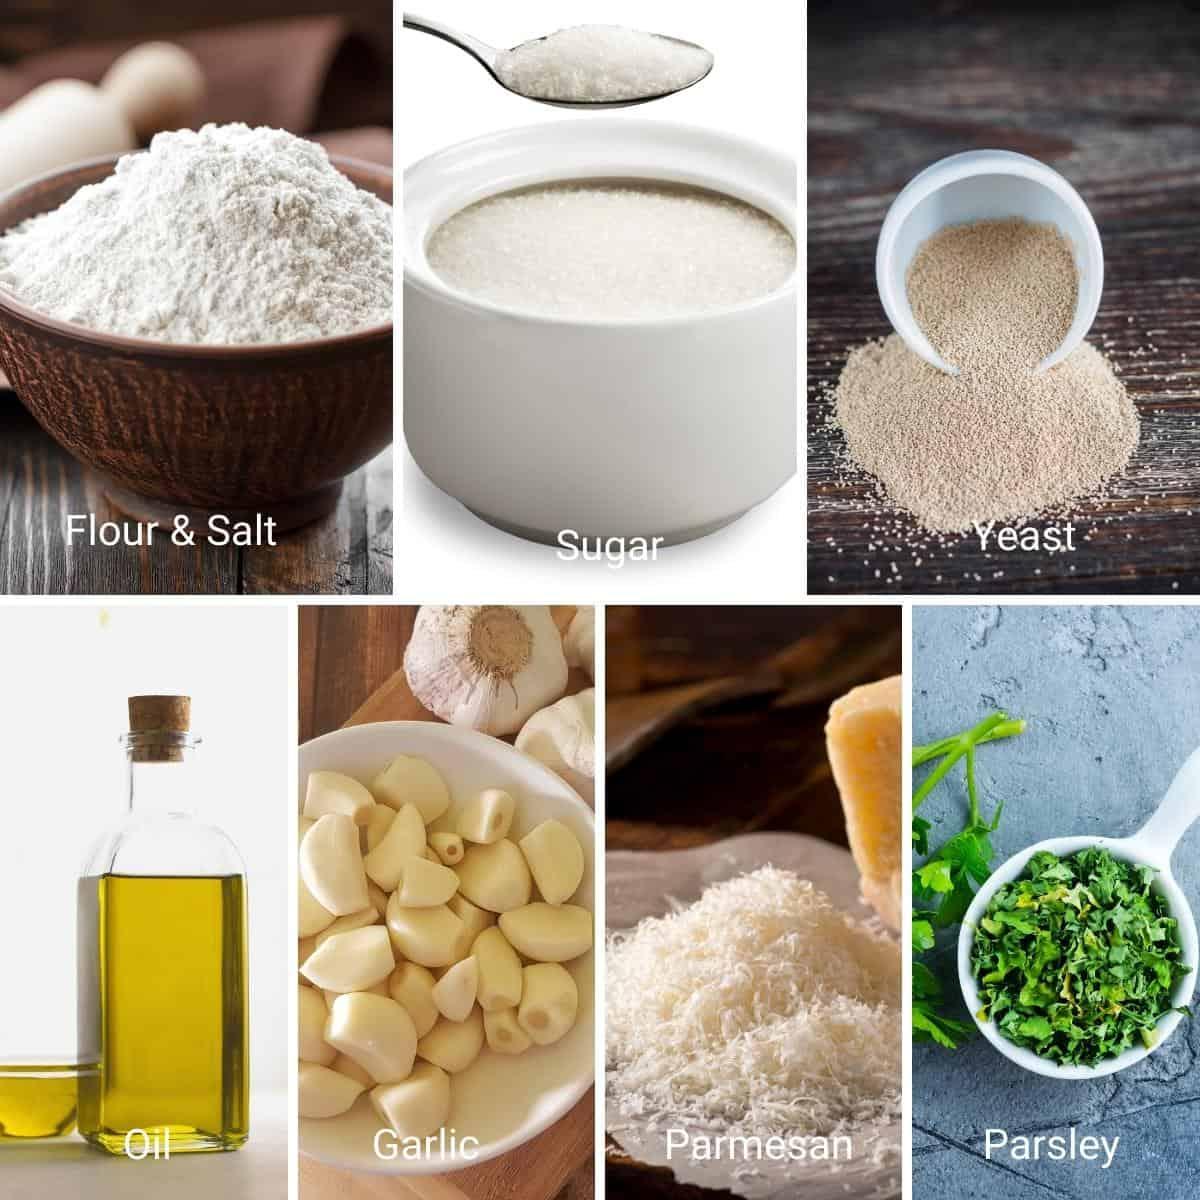 Ingredients shot collage for garlic rolls.